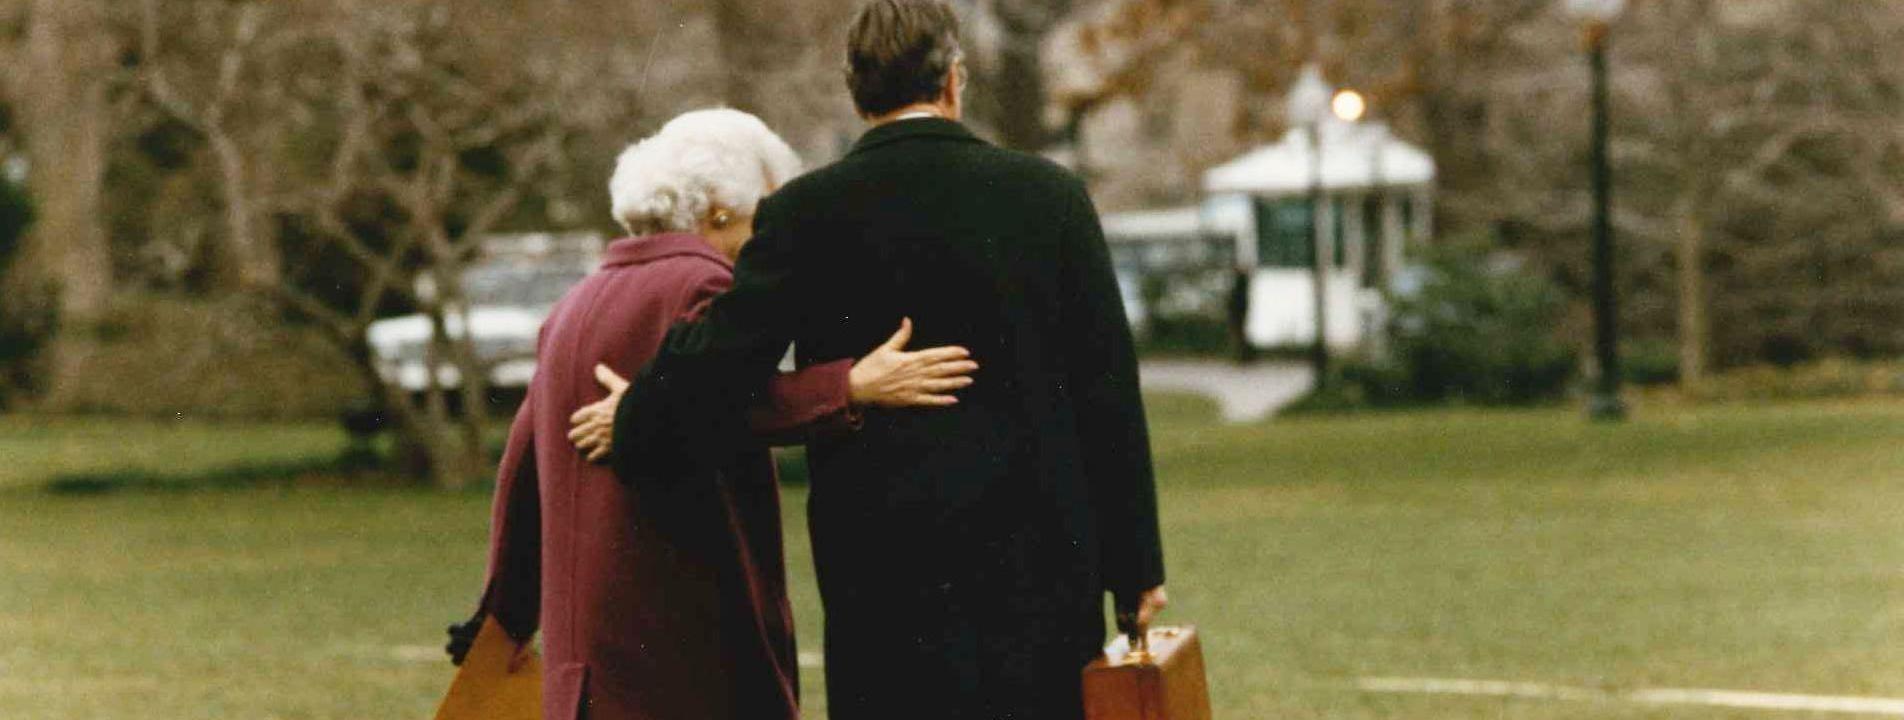 George And Barbara Bush leave